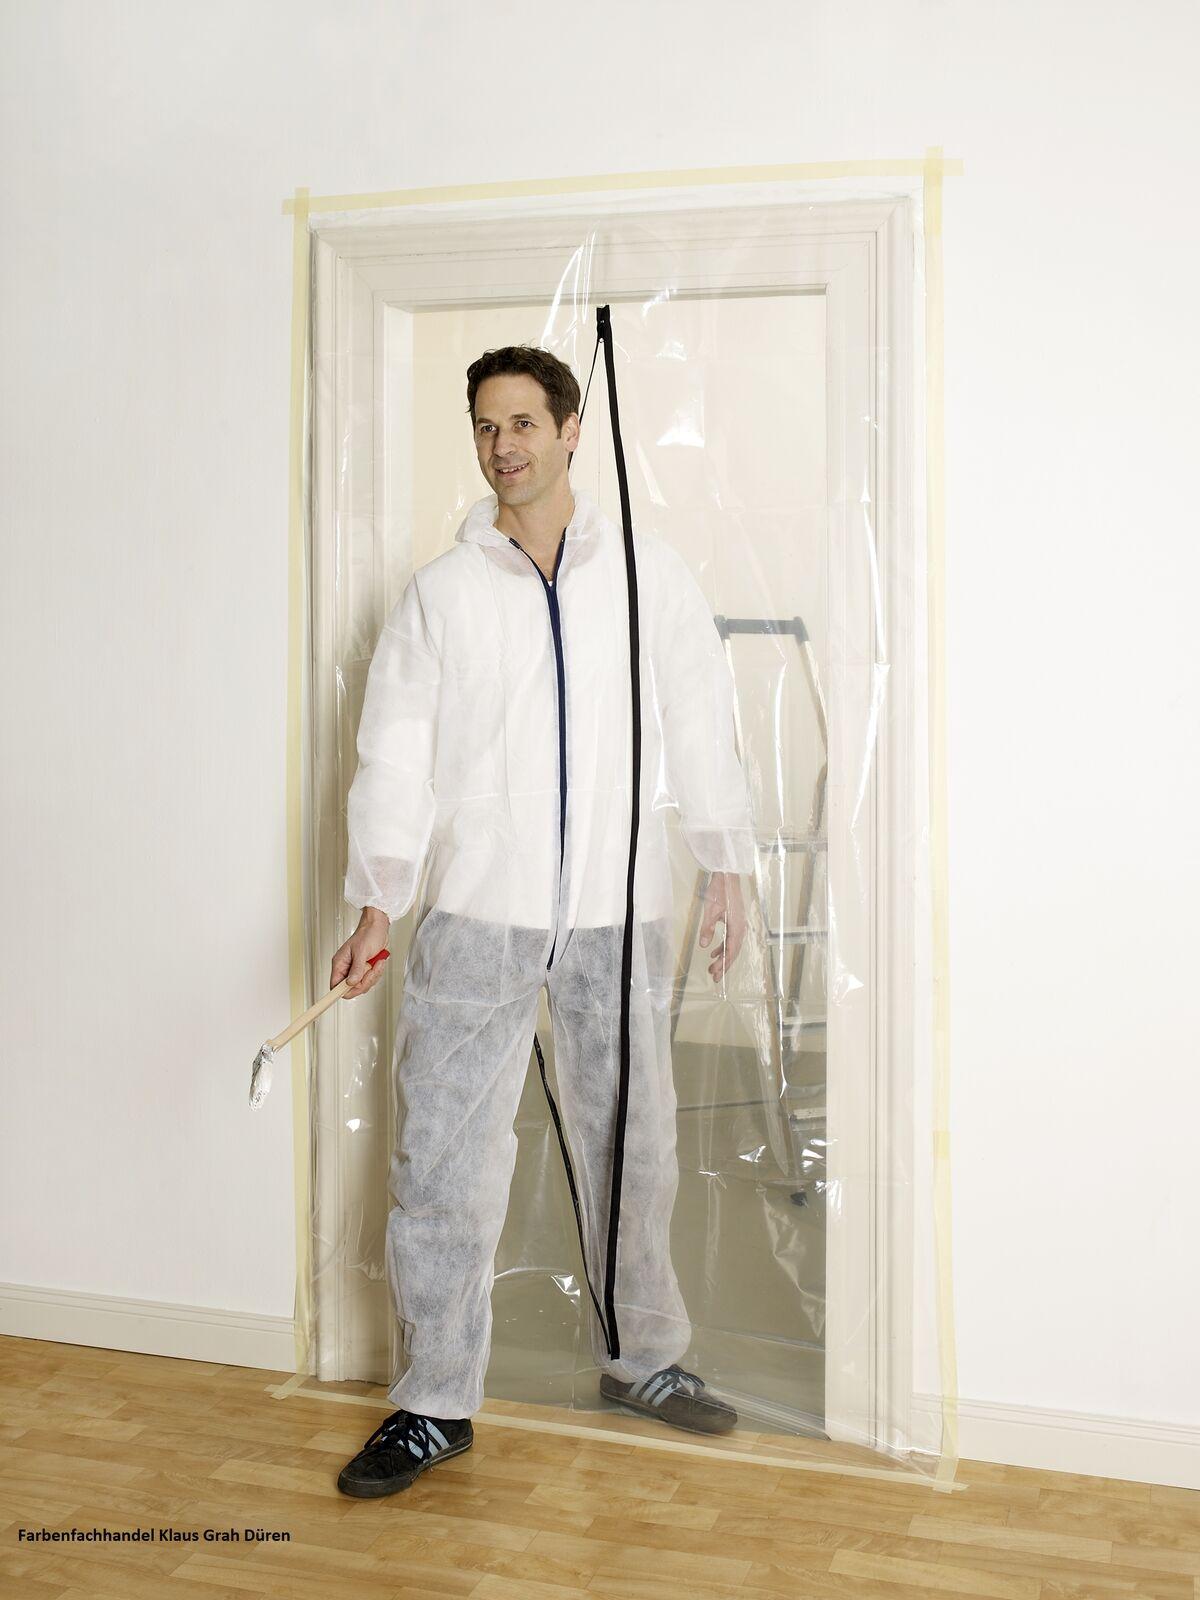 folient r mit rei verschlu 2100 x 1150 mm staubschutzt r baut re eur 12 08 picclick de. Black Bedroom Furniture Sets. Home Design Ideas